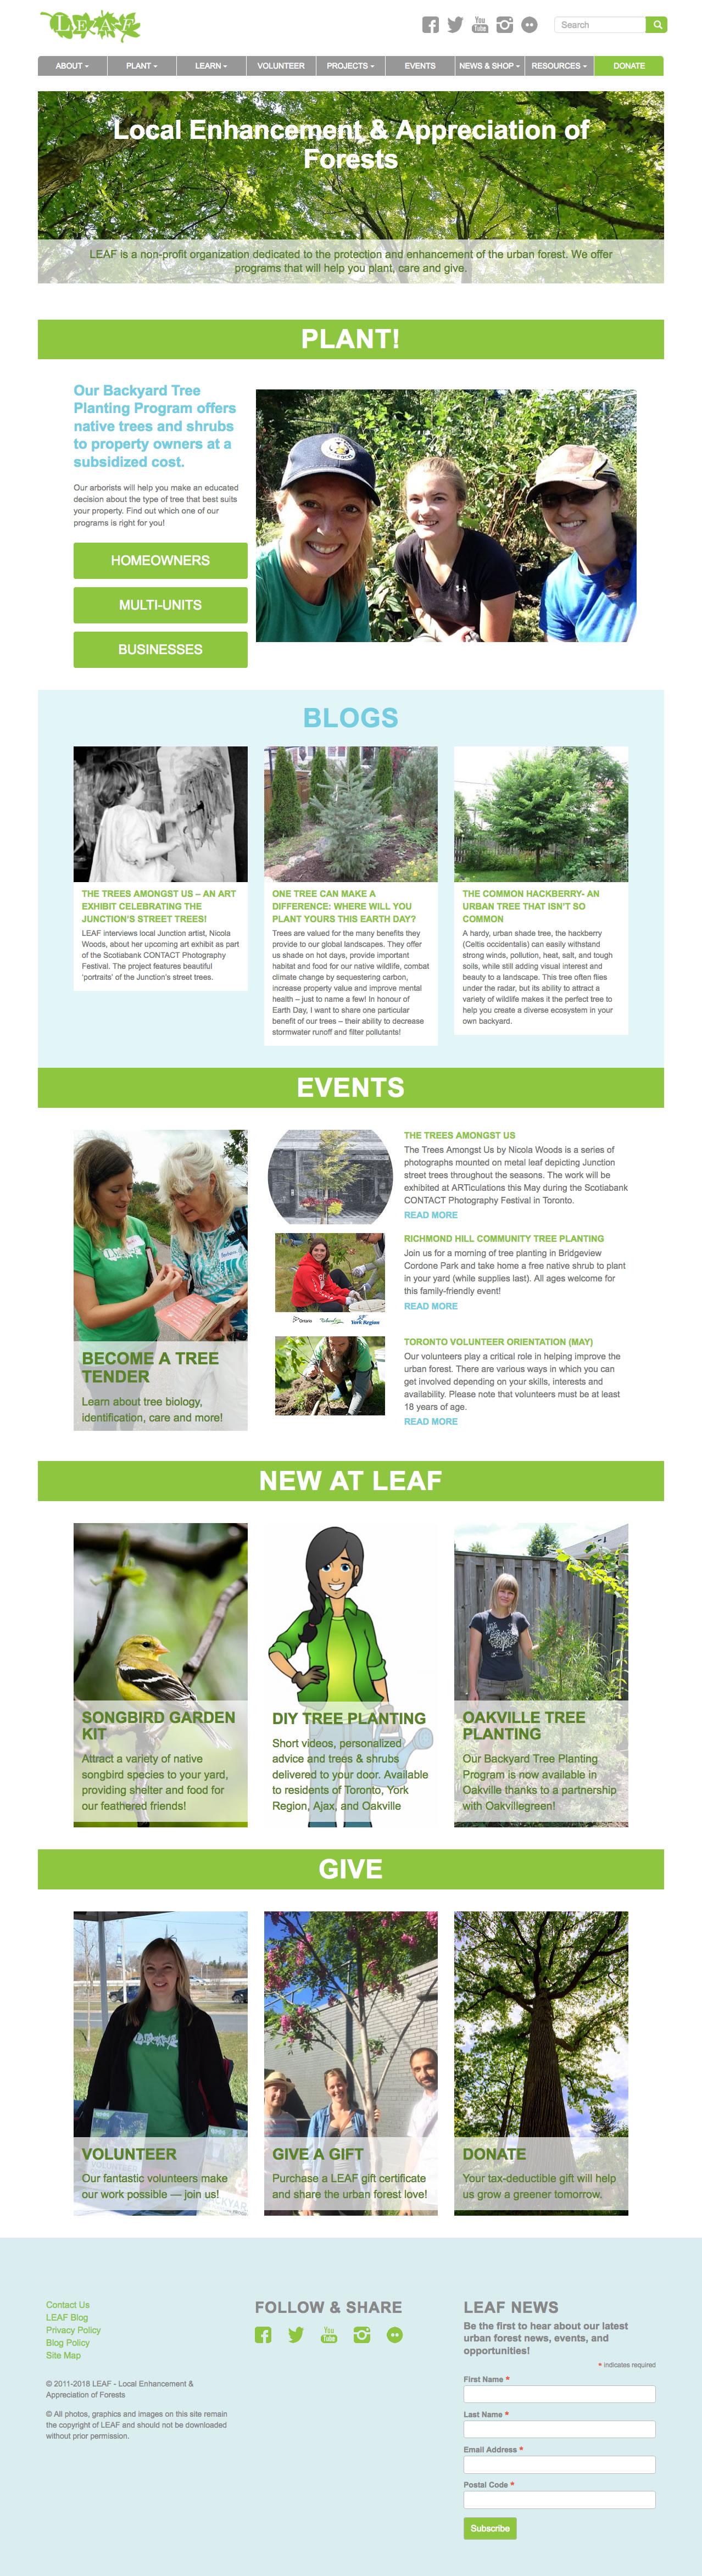 LEAF web site screenshot